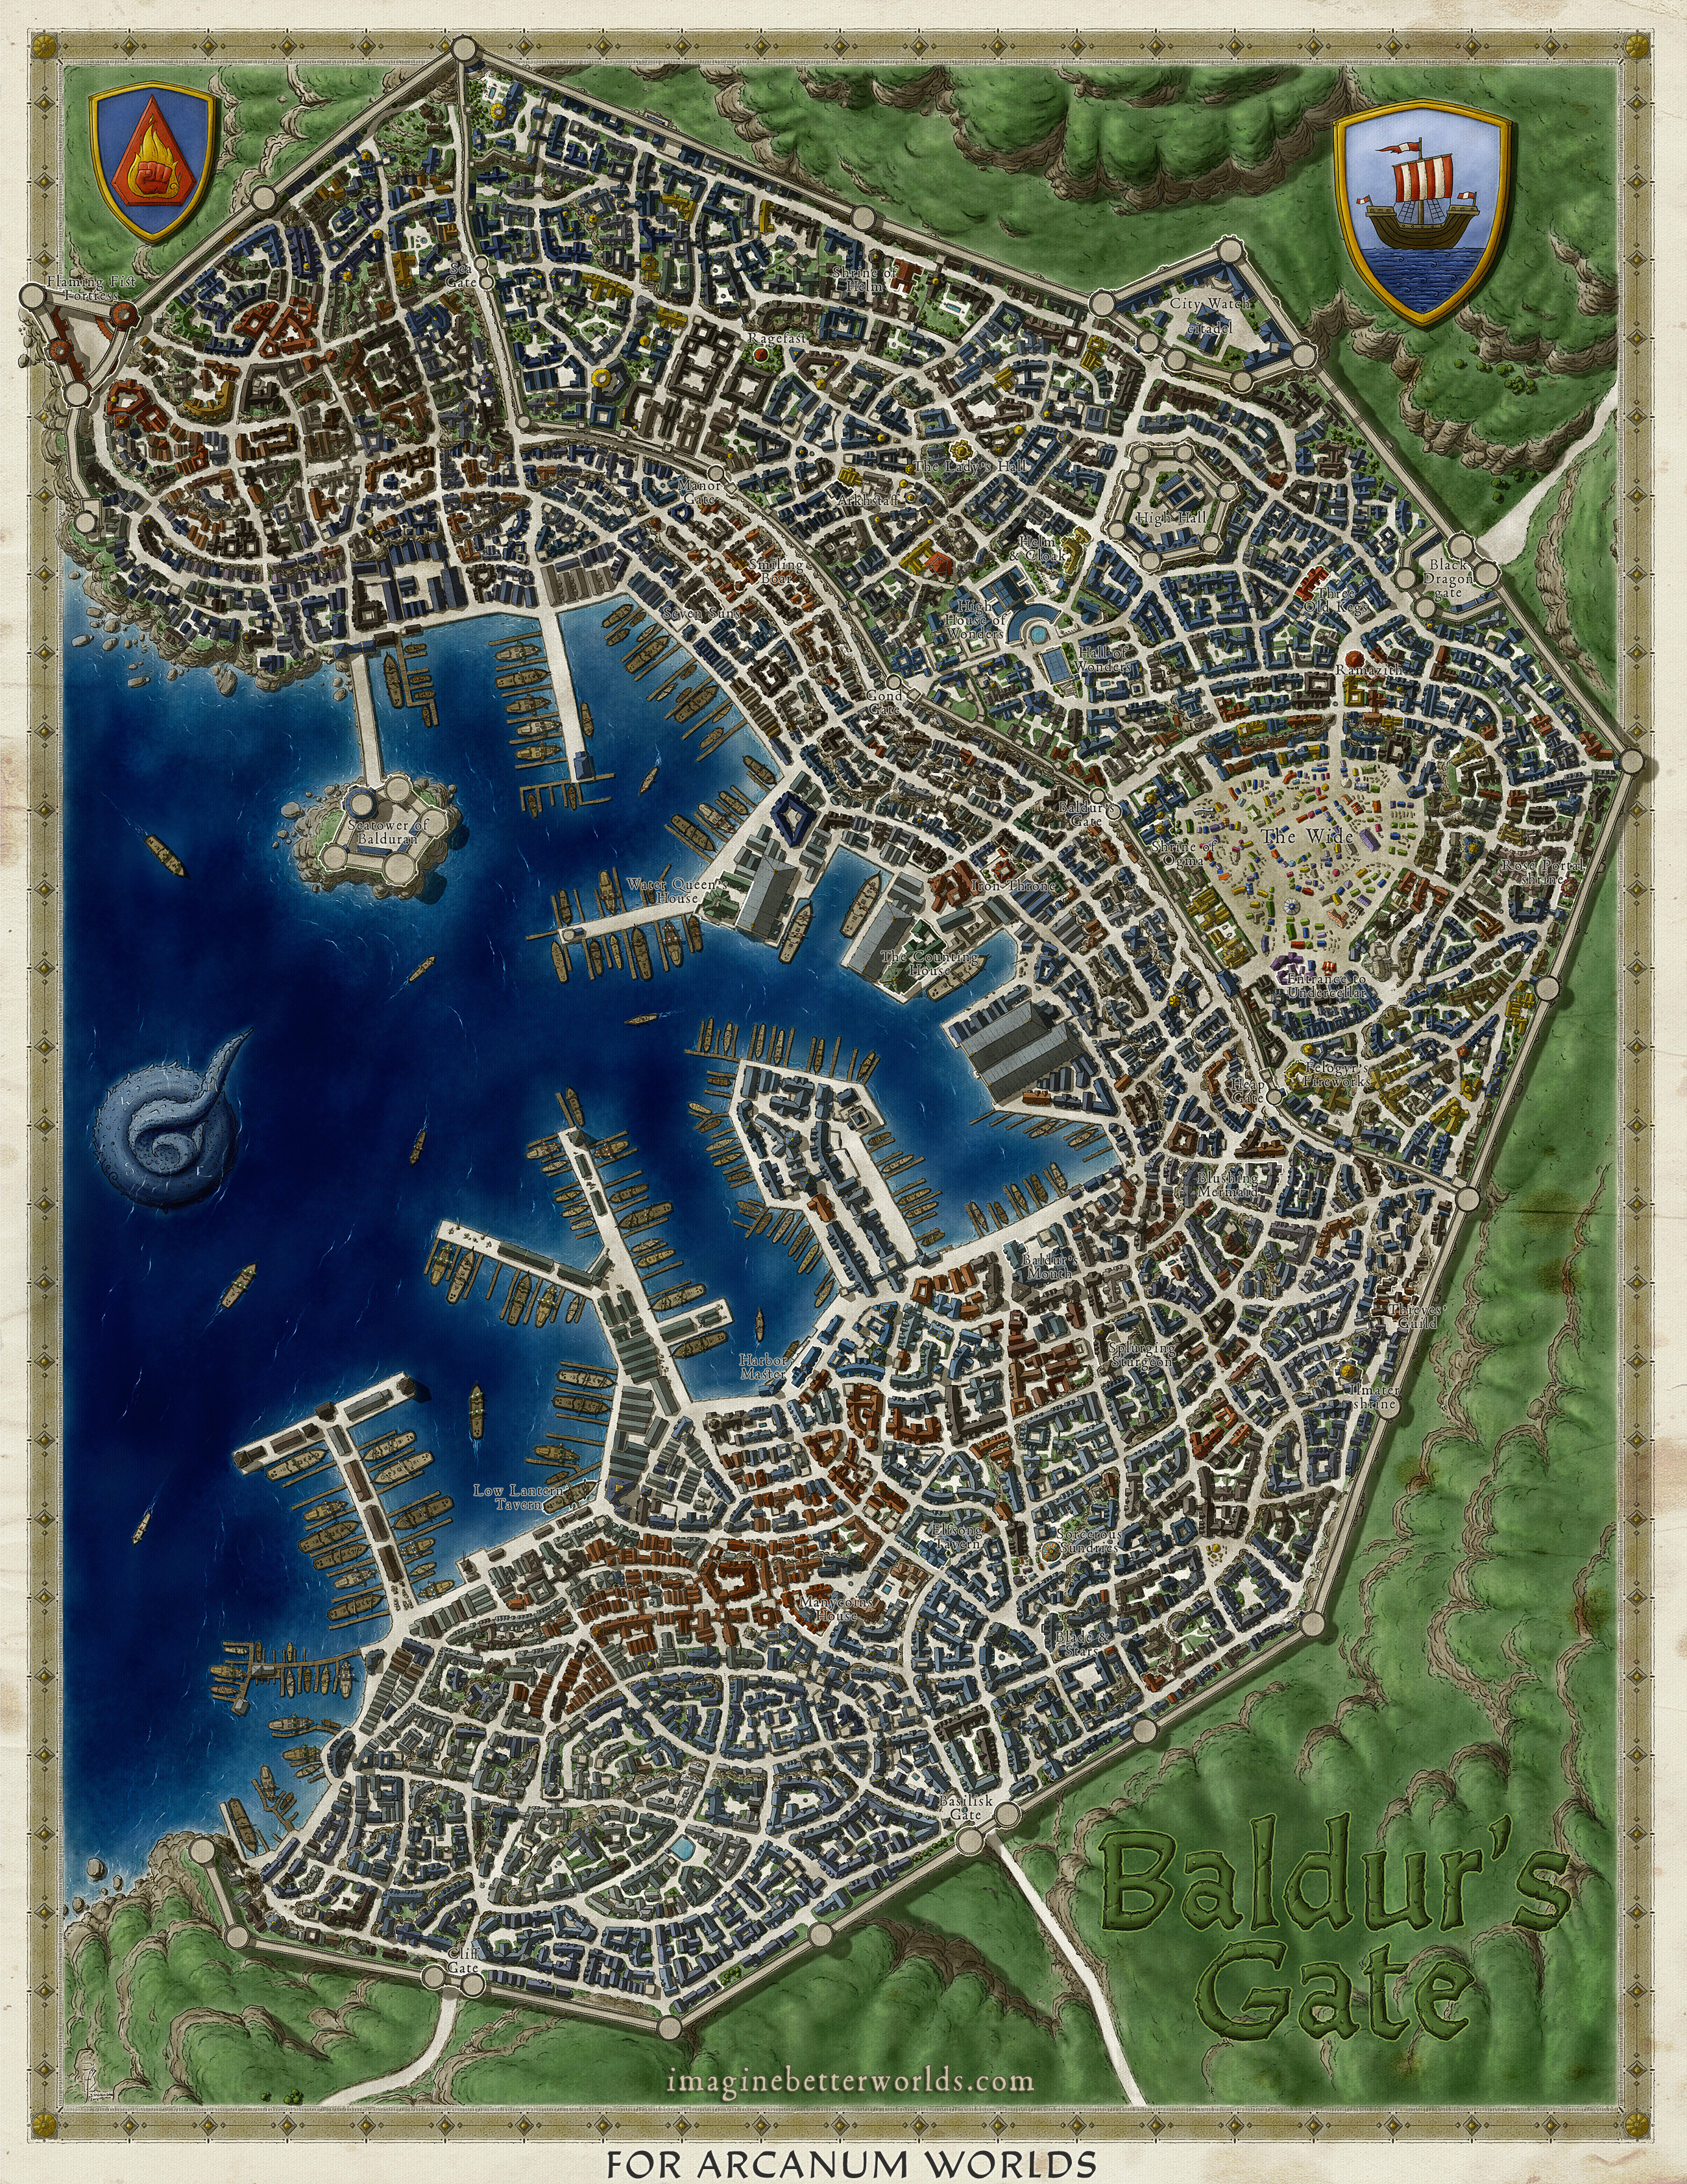 Baldur S Gate City Map By Sirinkman On Deviantart